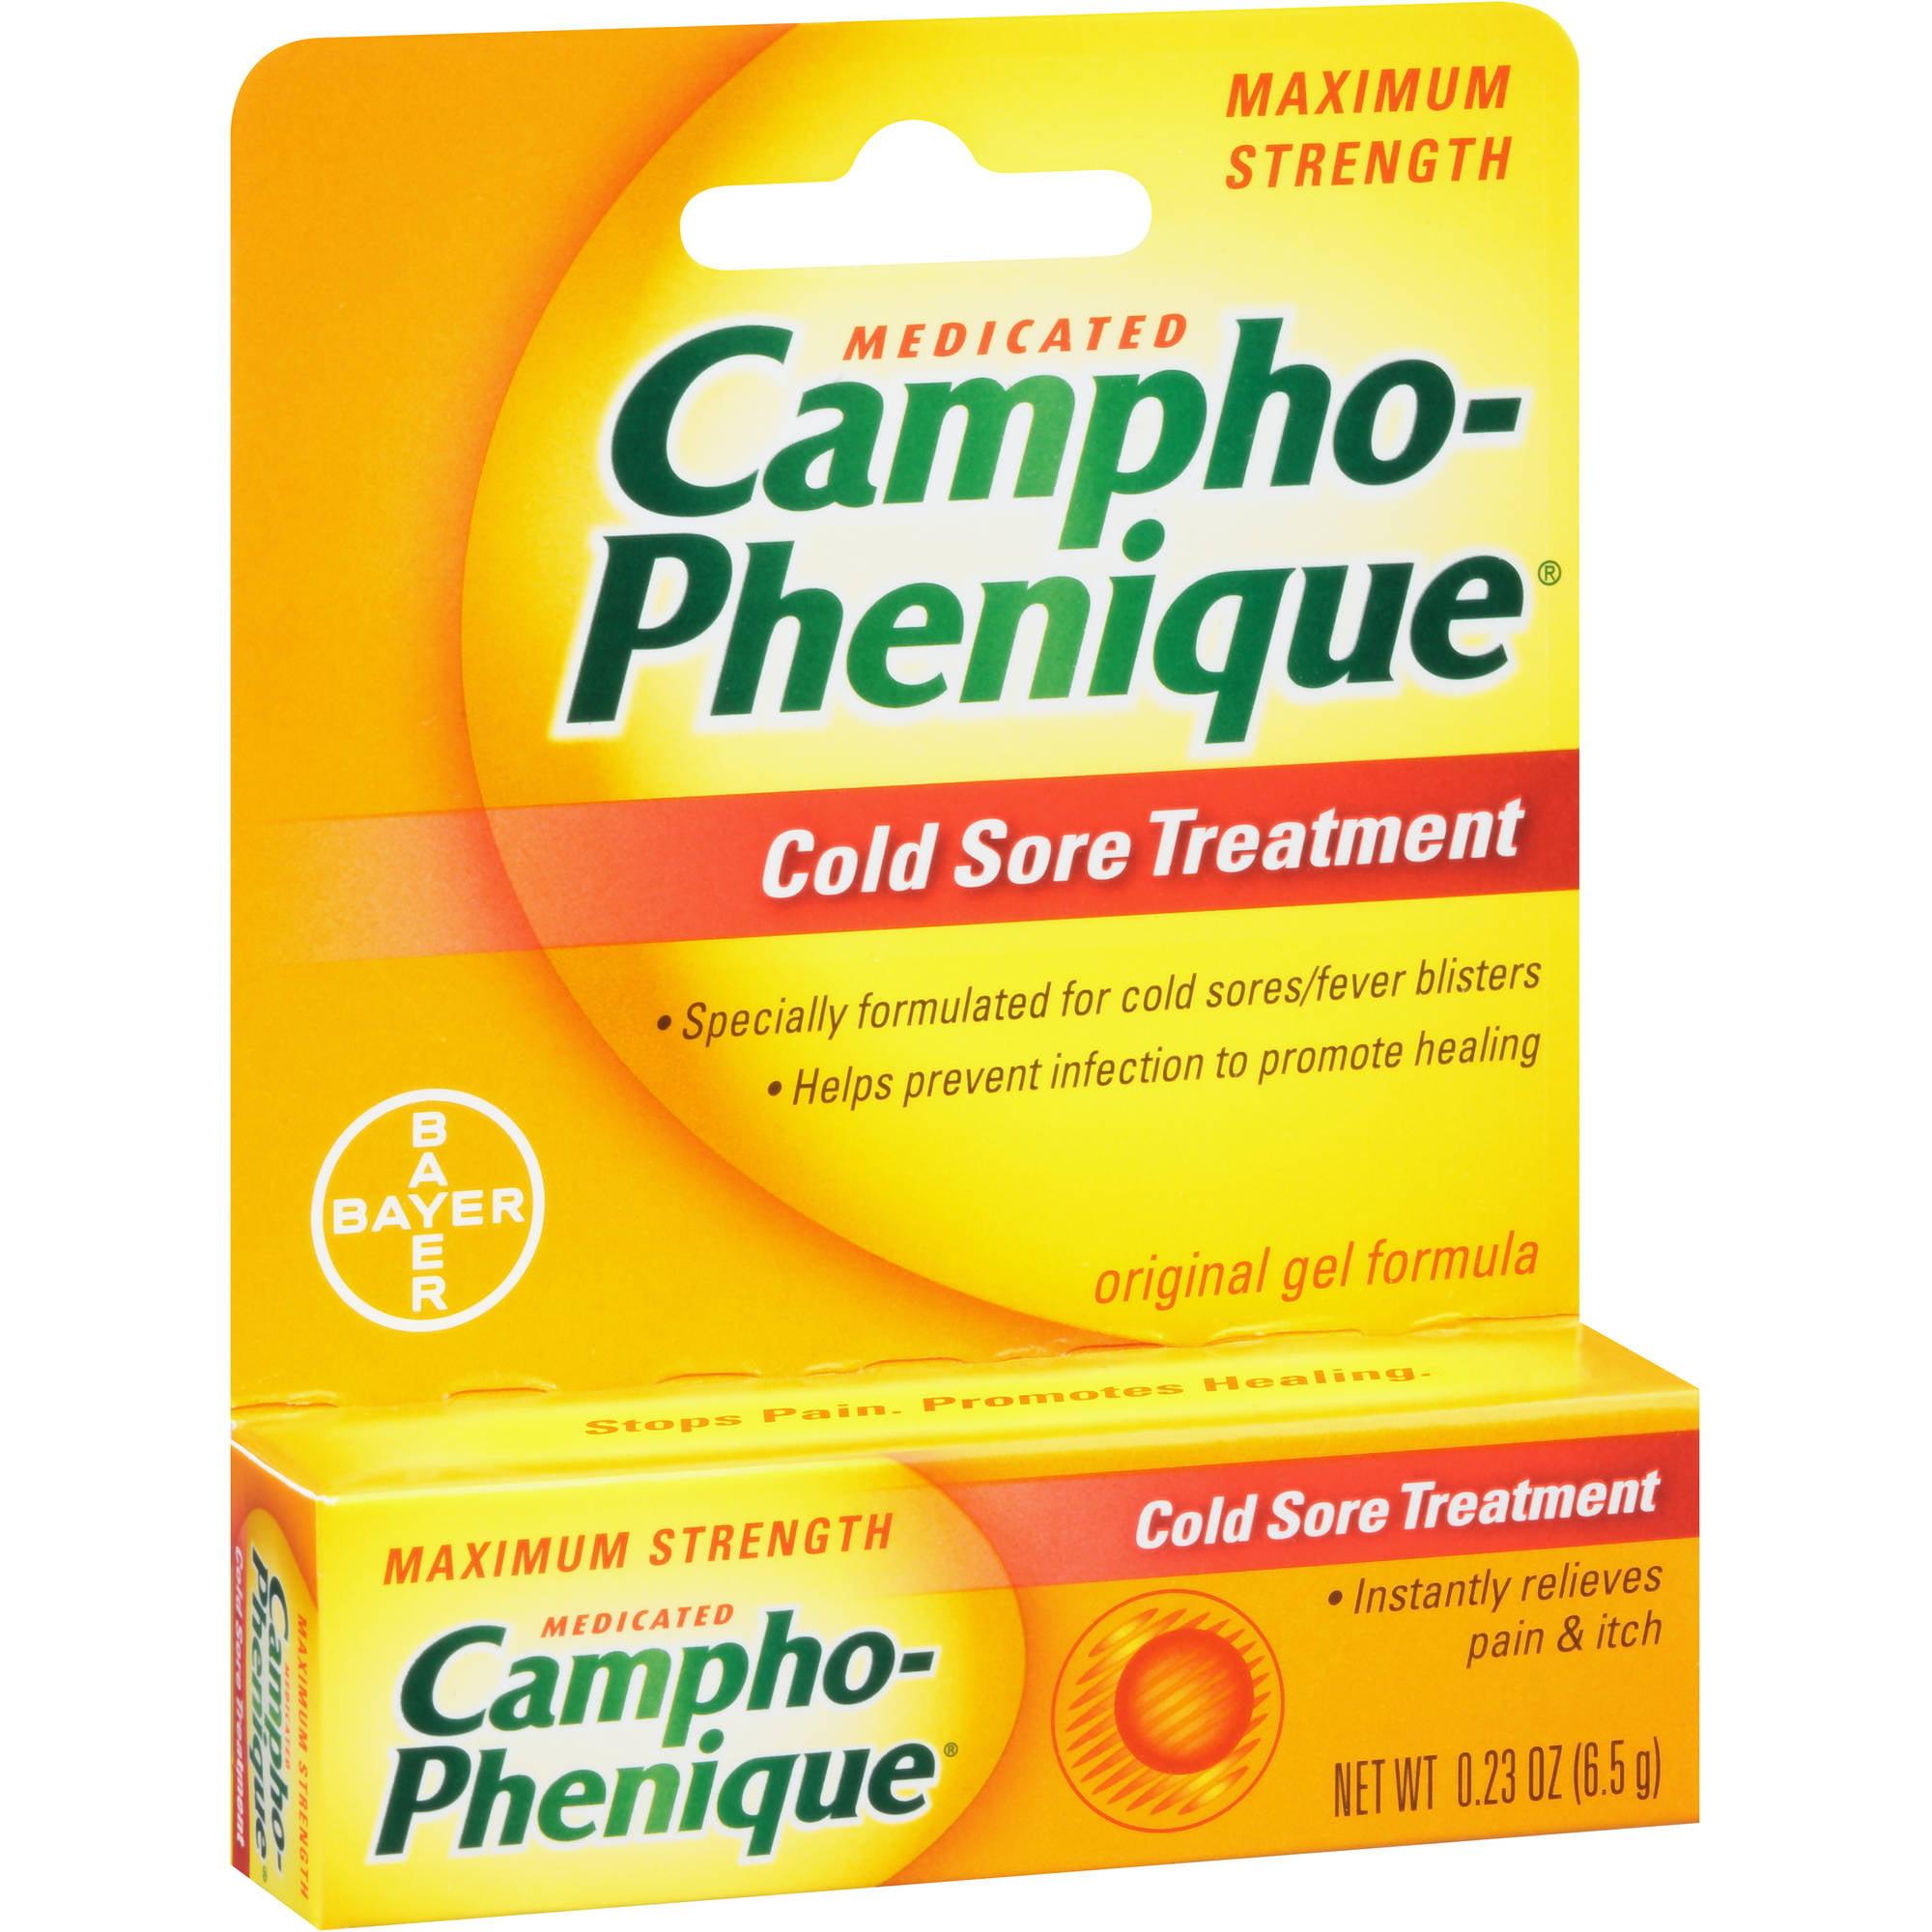 Campho-Phenique Maximum Strength Cold Sore Treatment, 0.23 oz